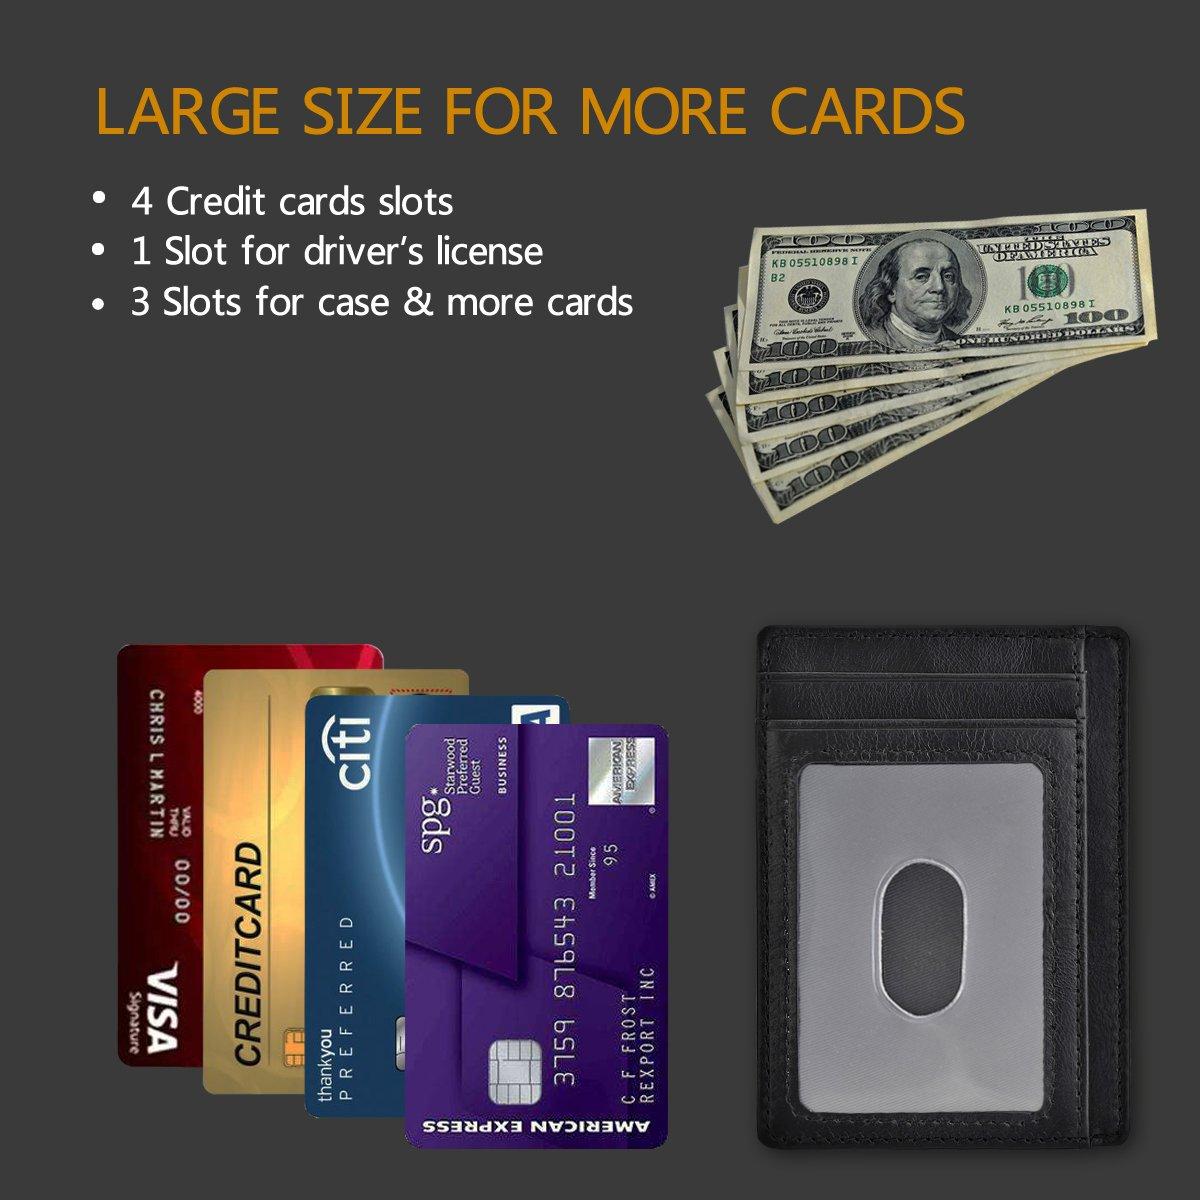 GH GOLD HORSE Slim RFID Blocking Card Holder Minimalist Leather Front Pocket Wallet for Women (Black) by GH GOLD HORSE (Image #5)